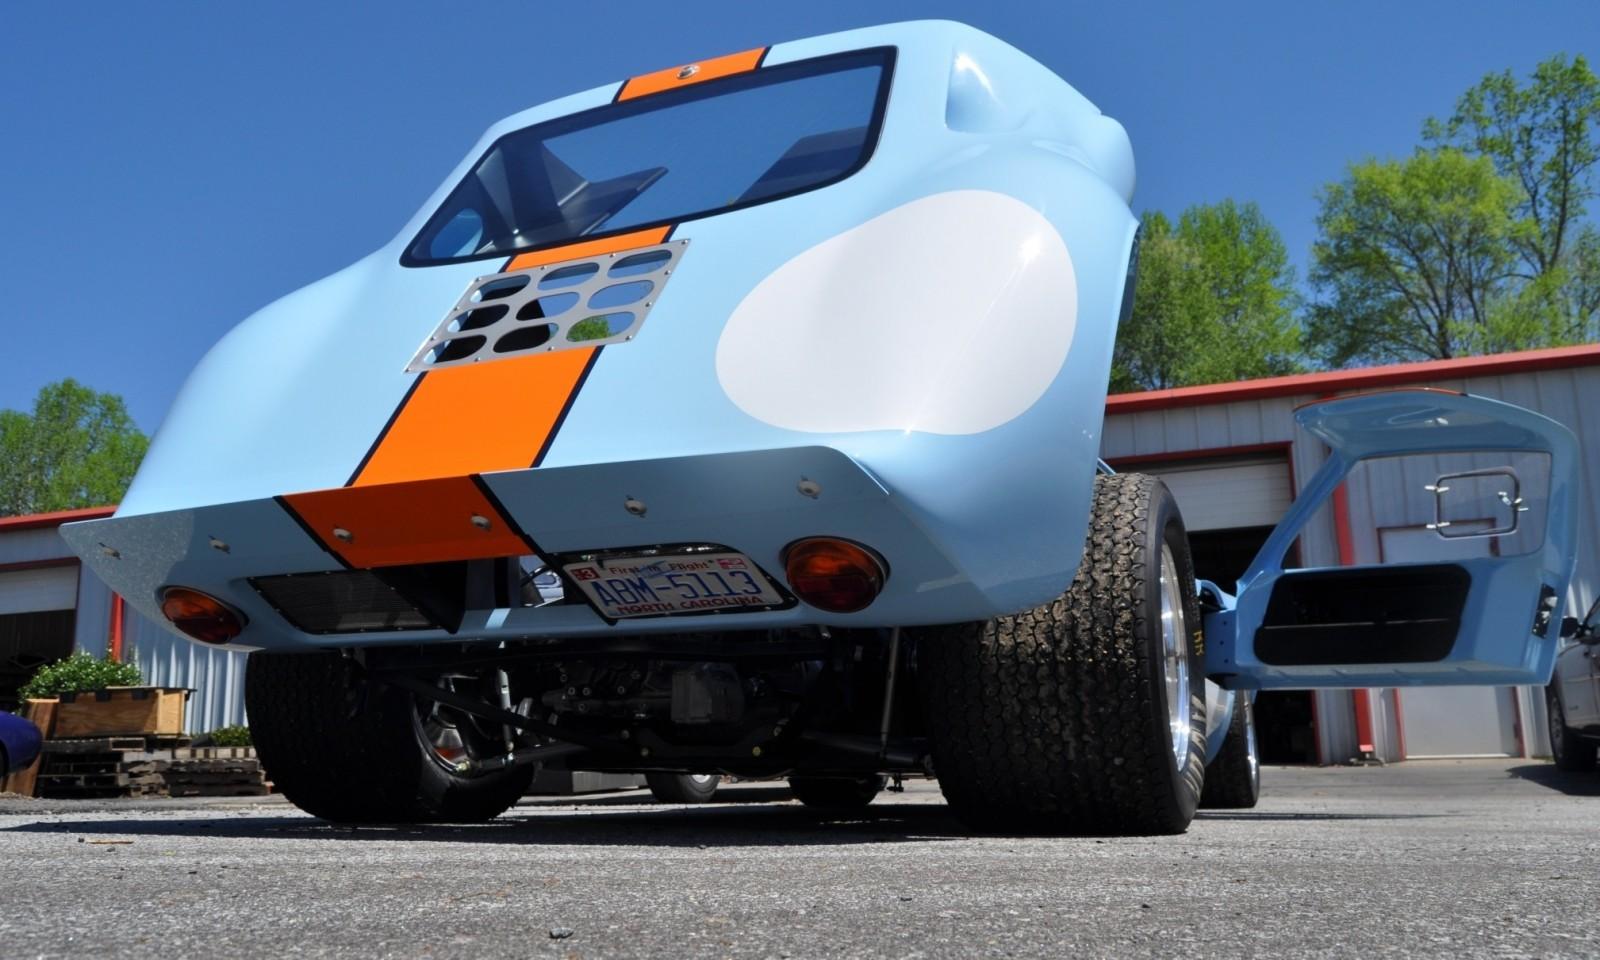 2014 Superformance GT40 Mark I - MEGA Photo Shoot and Ride-Along Videos 75